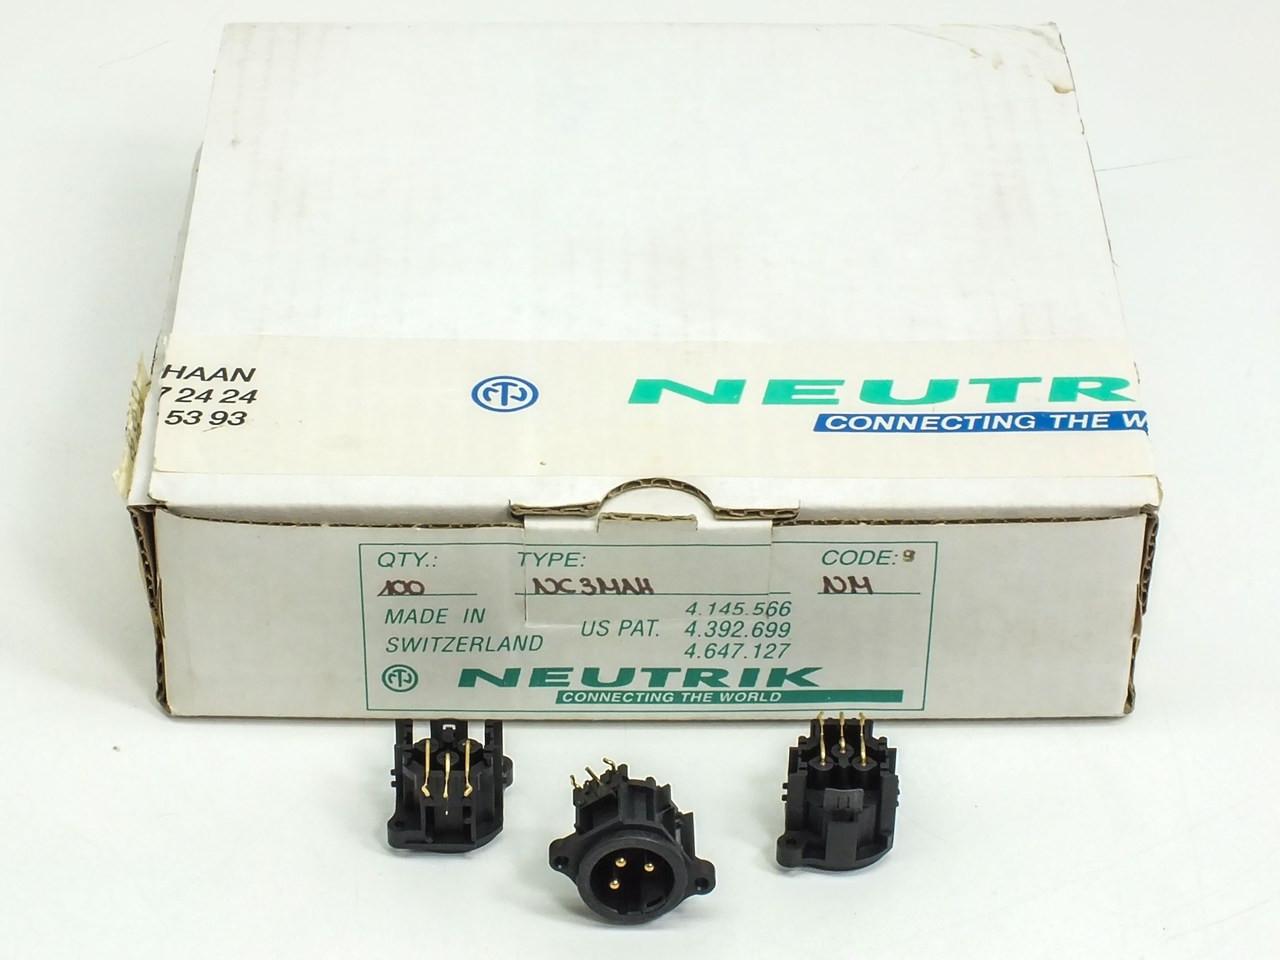 hight resolution of neutrik nc3mah 3 pole male xlr receptacle plastic housing box of 100